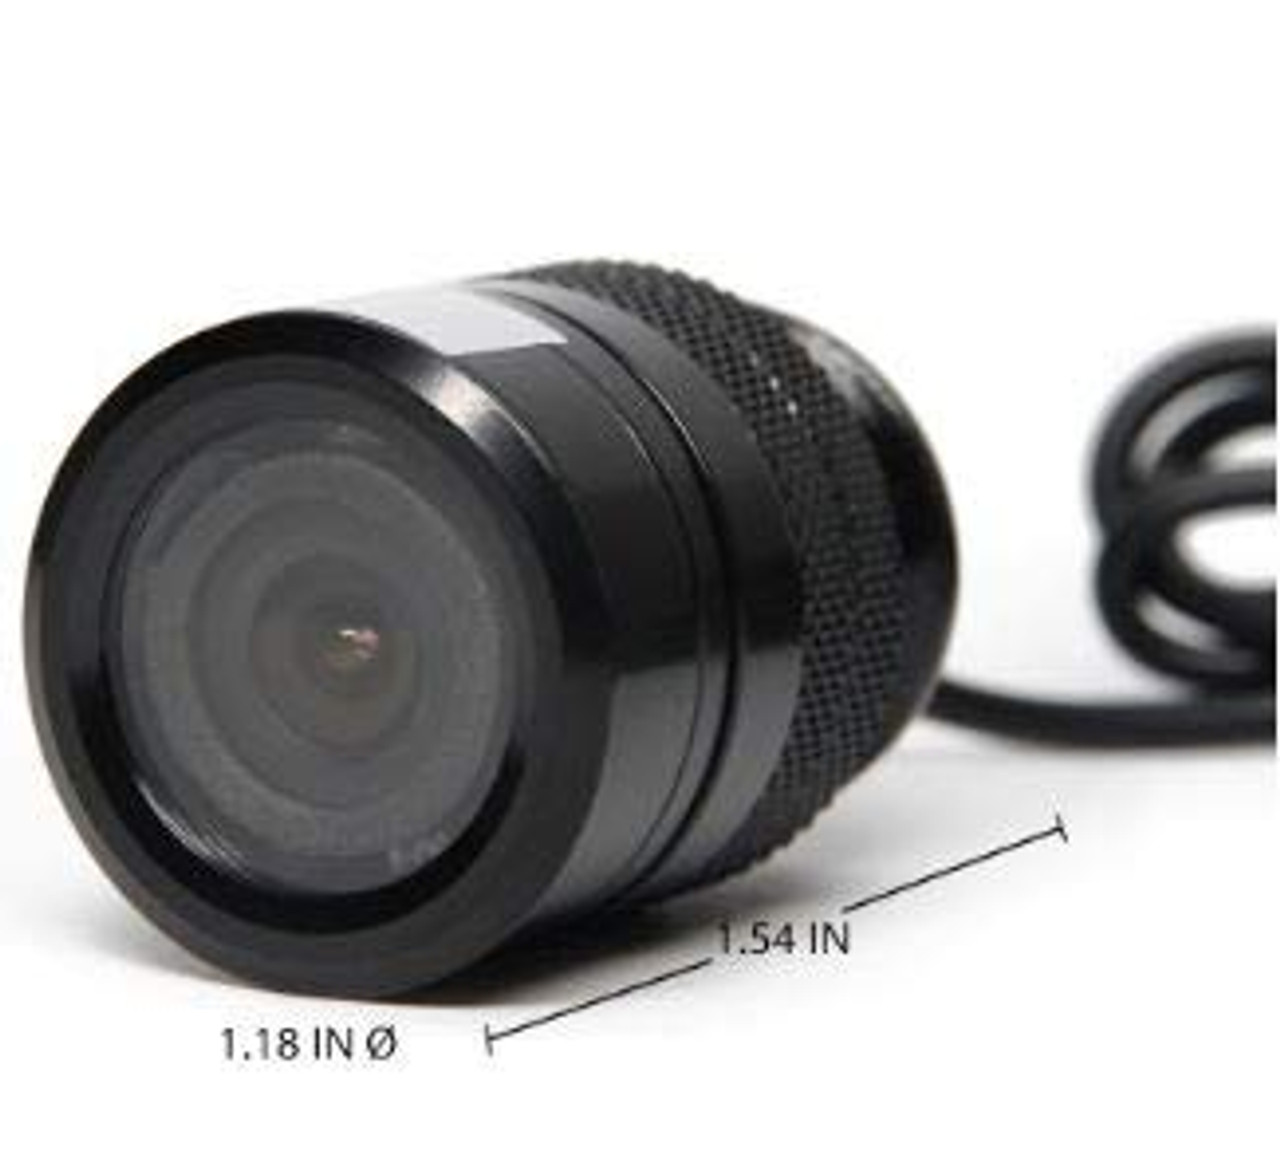 Flush Mount Backup Camera (RVS-772)